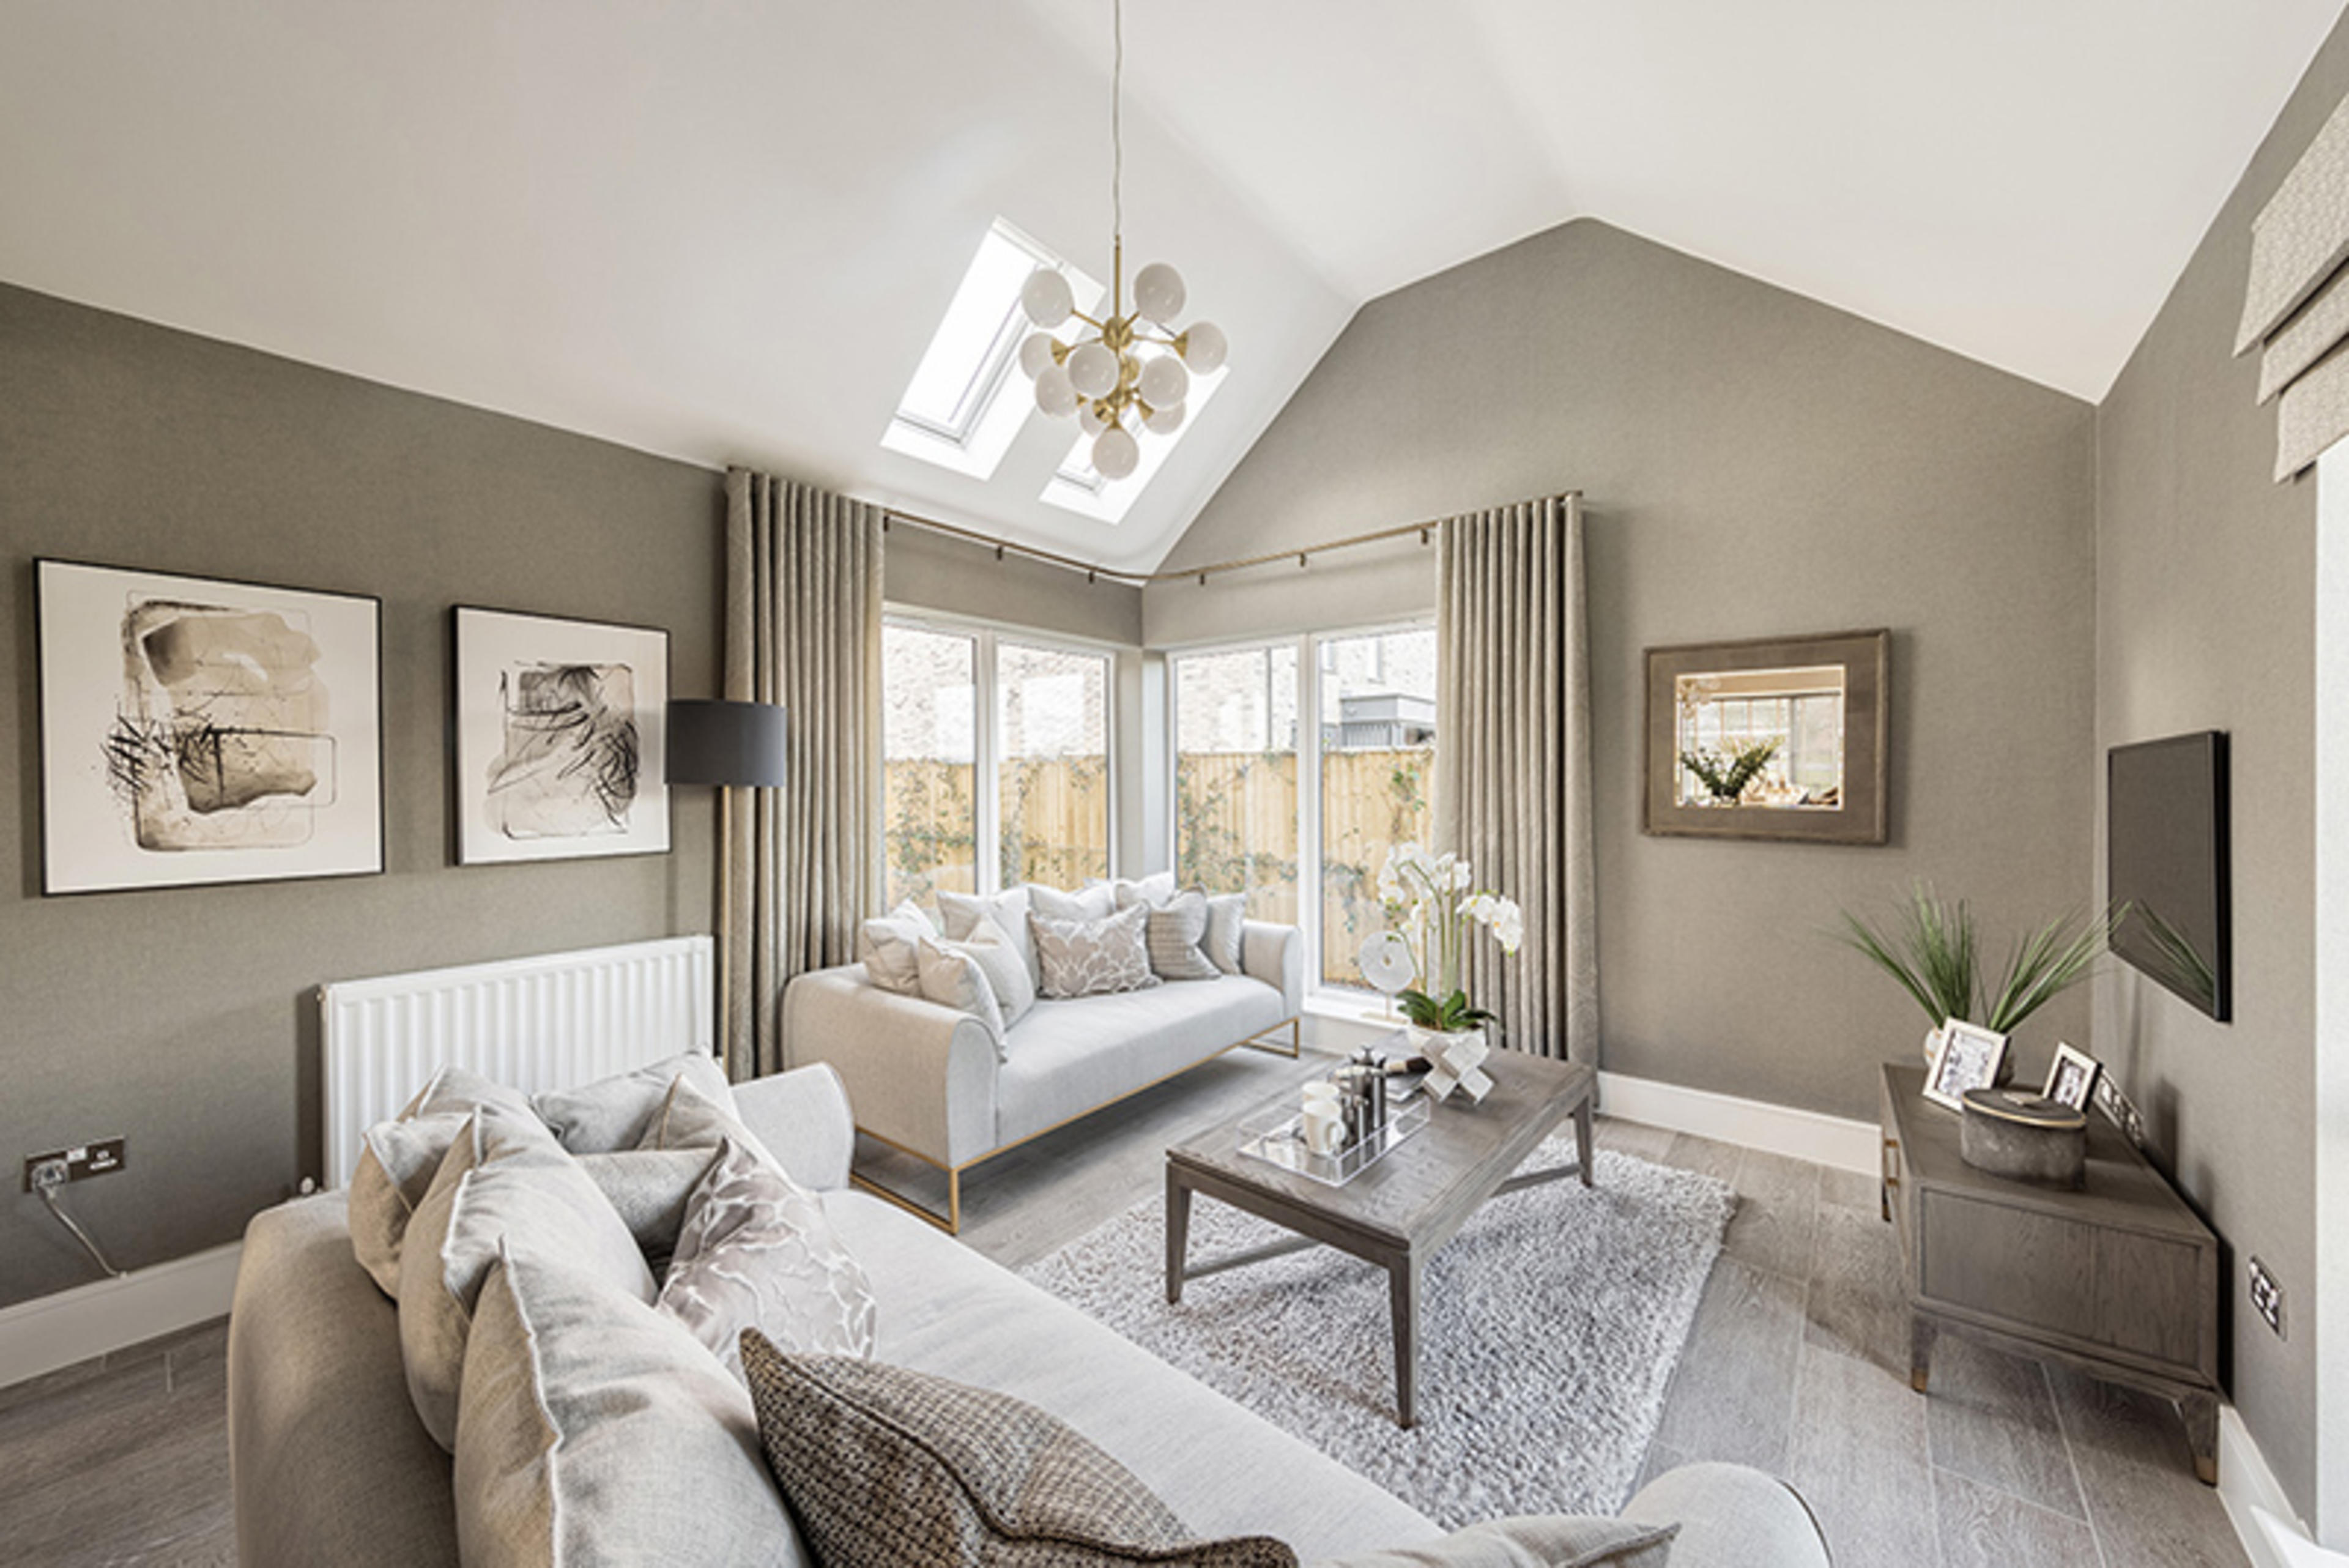 watling-grange-harrogate-merevale-4-bed-home-rear-living-room-2